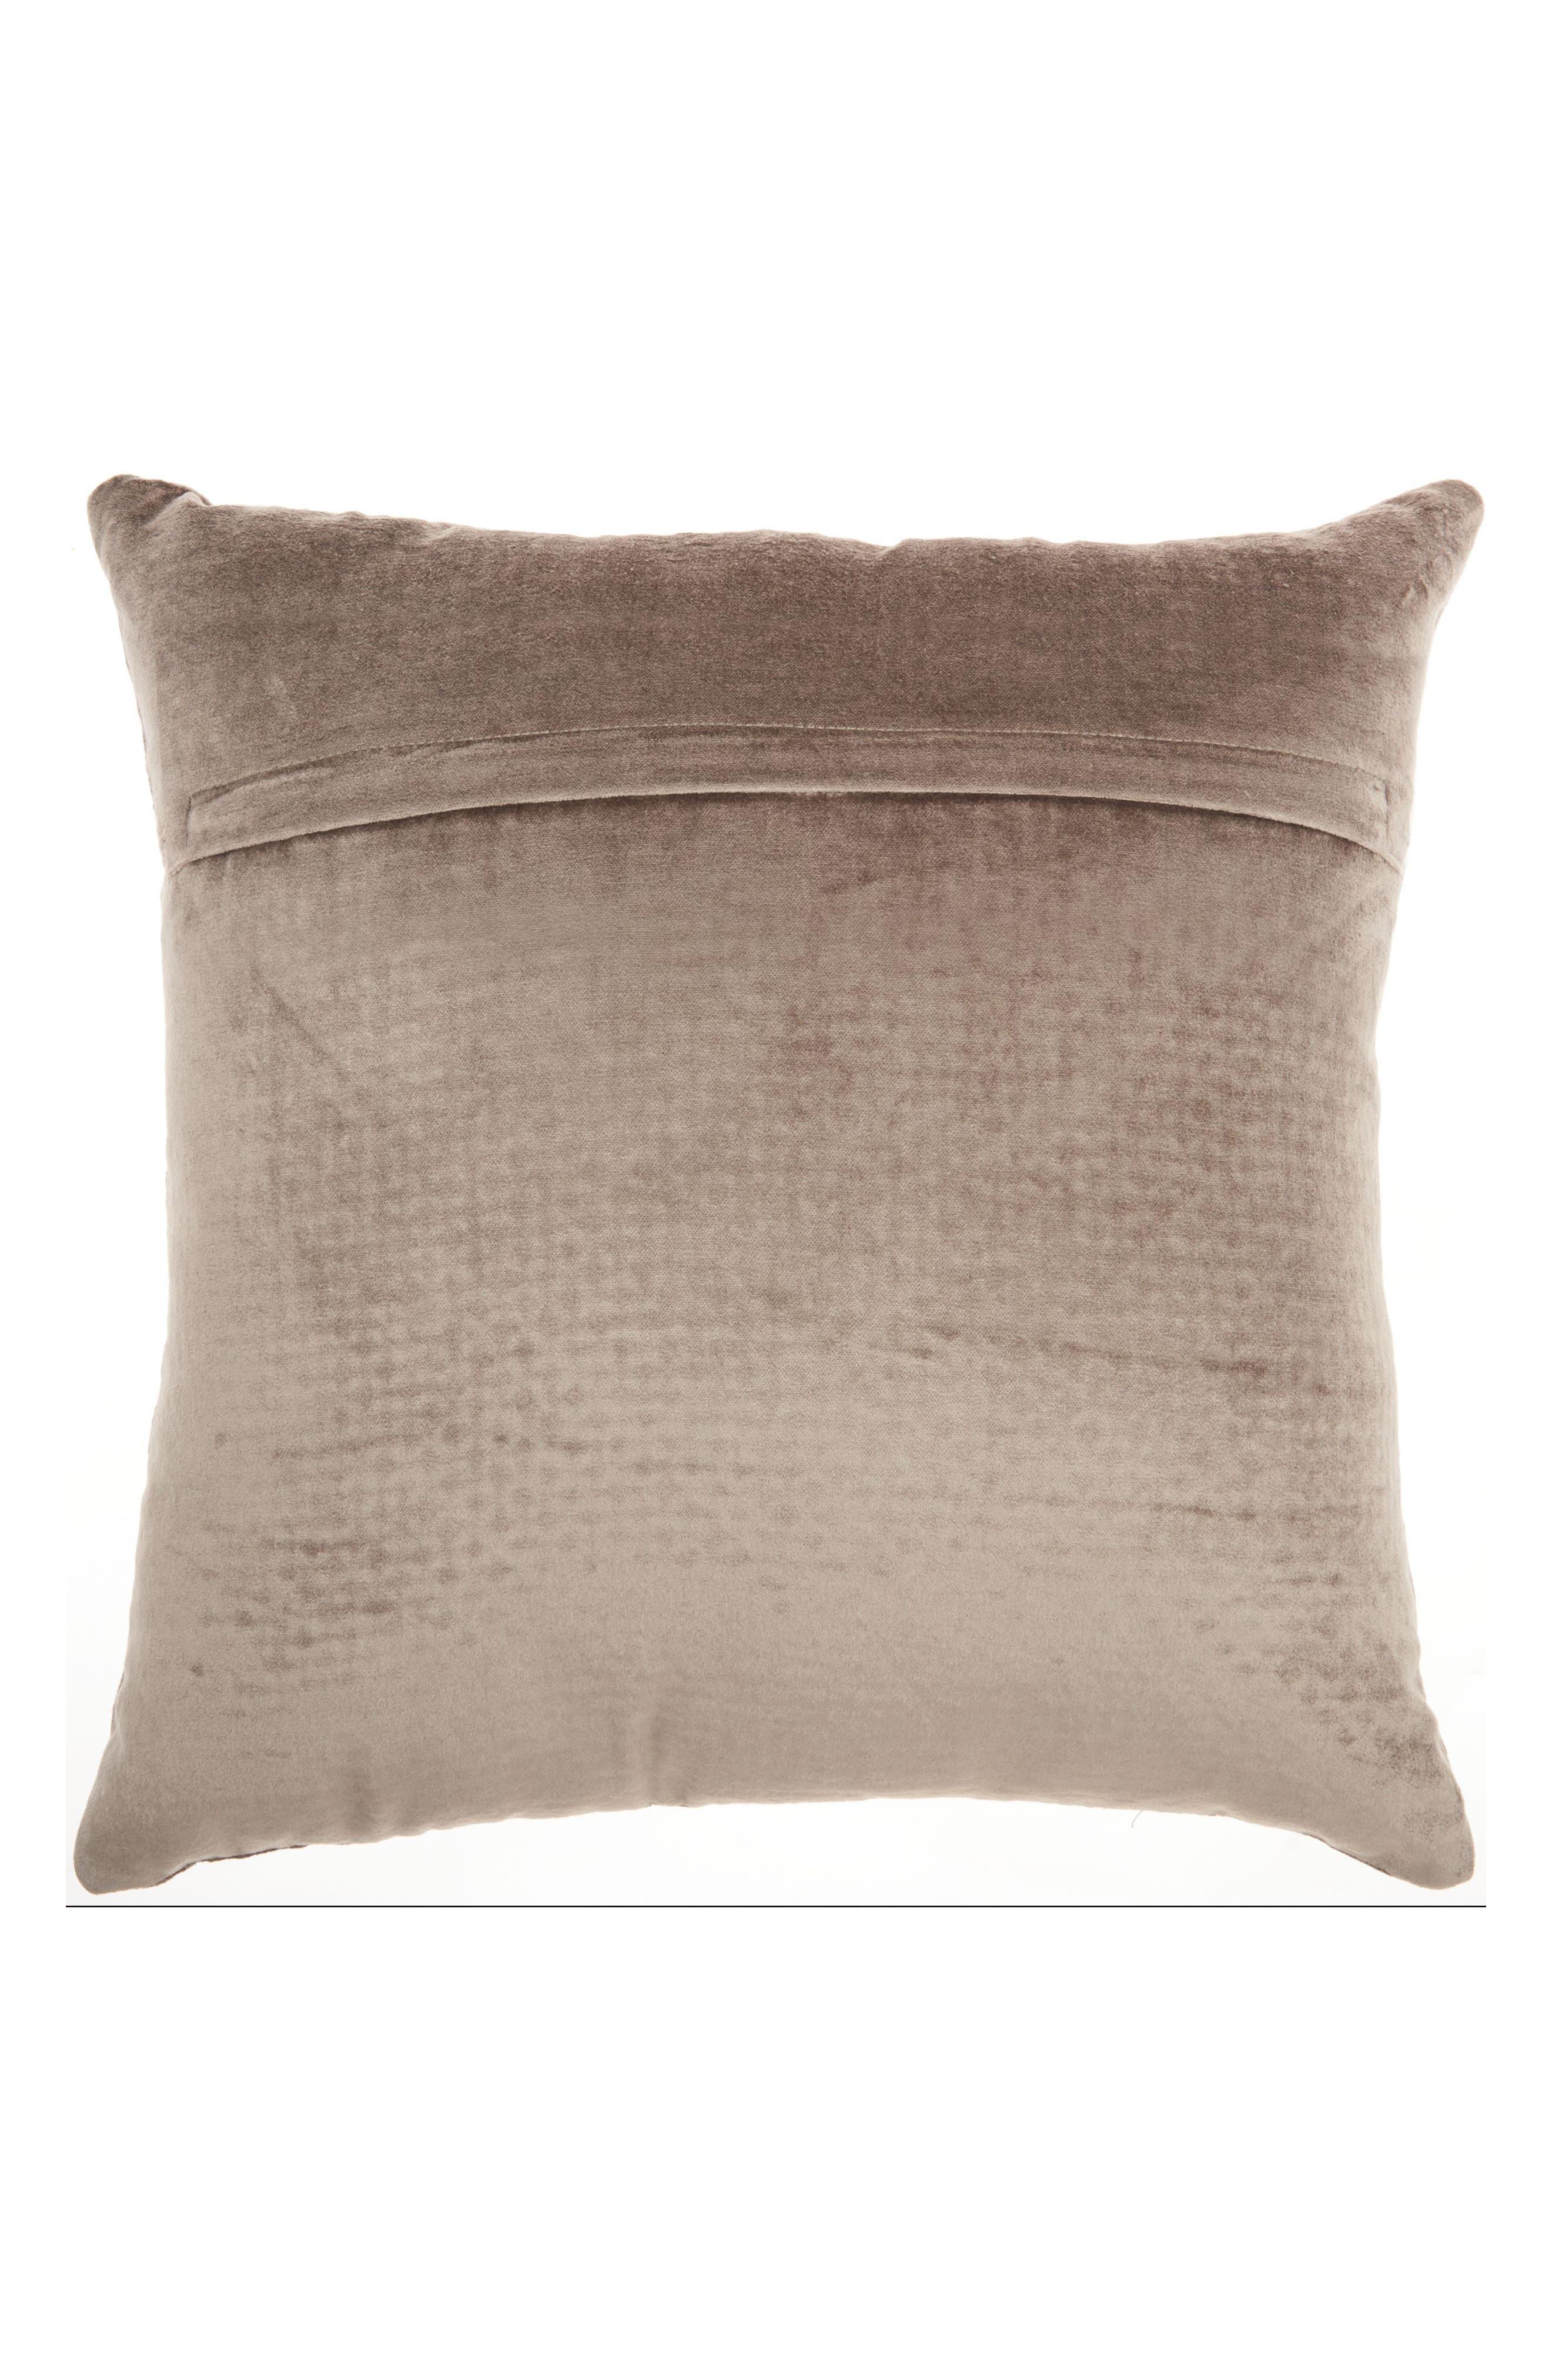 MINA VICTORY,                             Cobble Jewel Accent Pillow,                             Alternate thumbnail 2, color,                             280